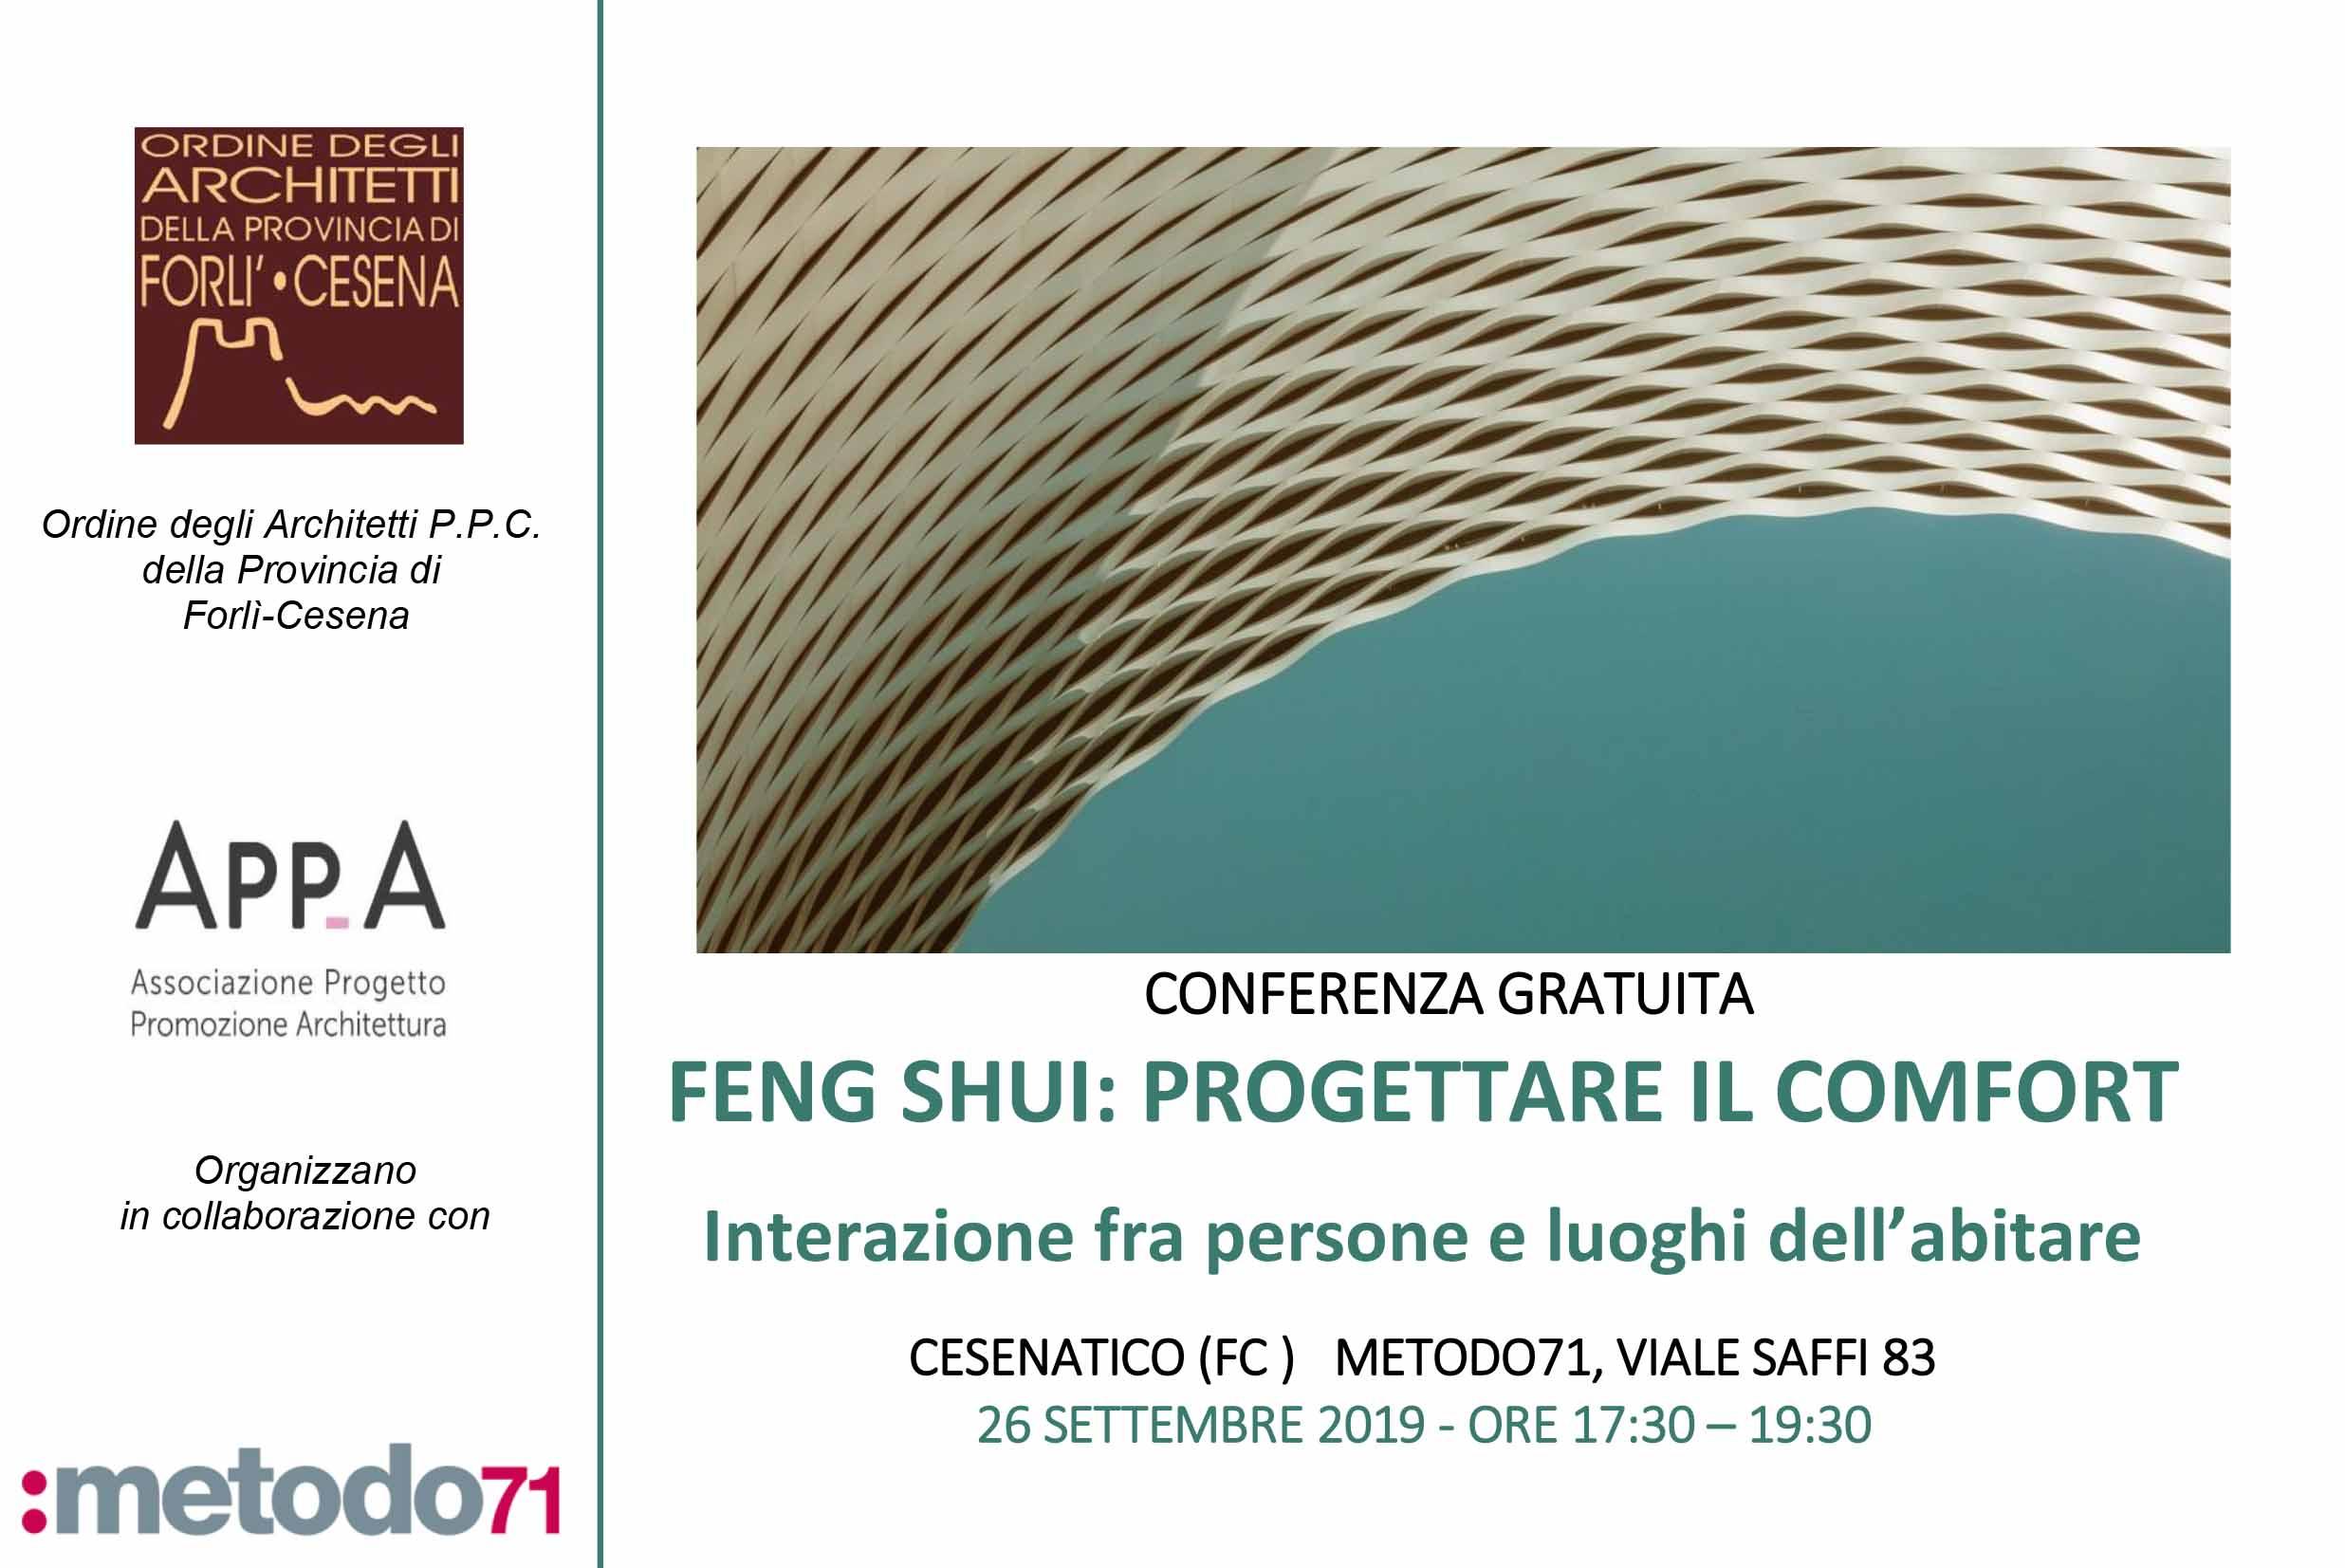 Evento - Conferenza